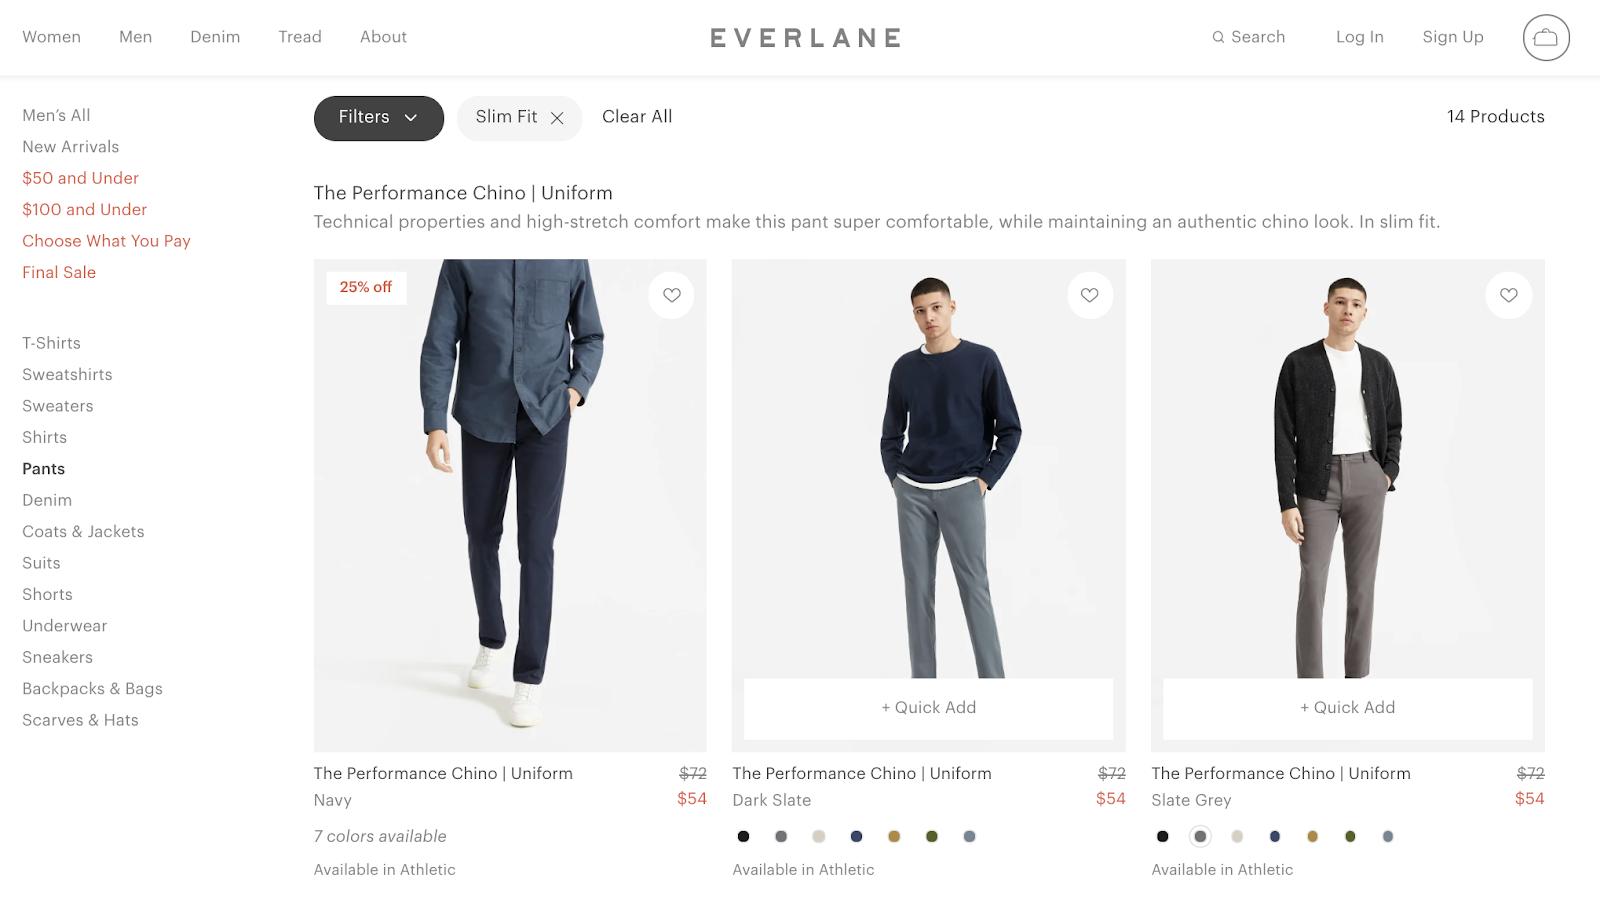 everlane product photos on ecommerce website